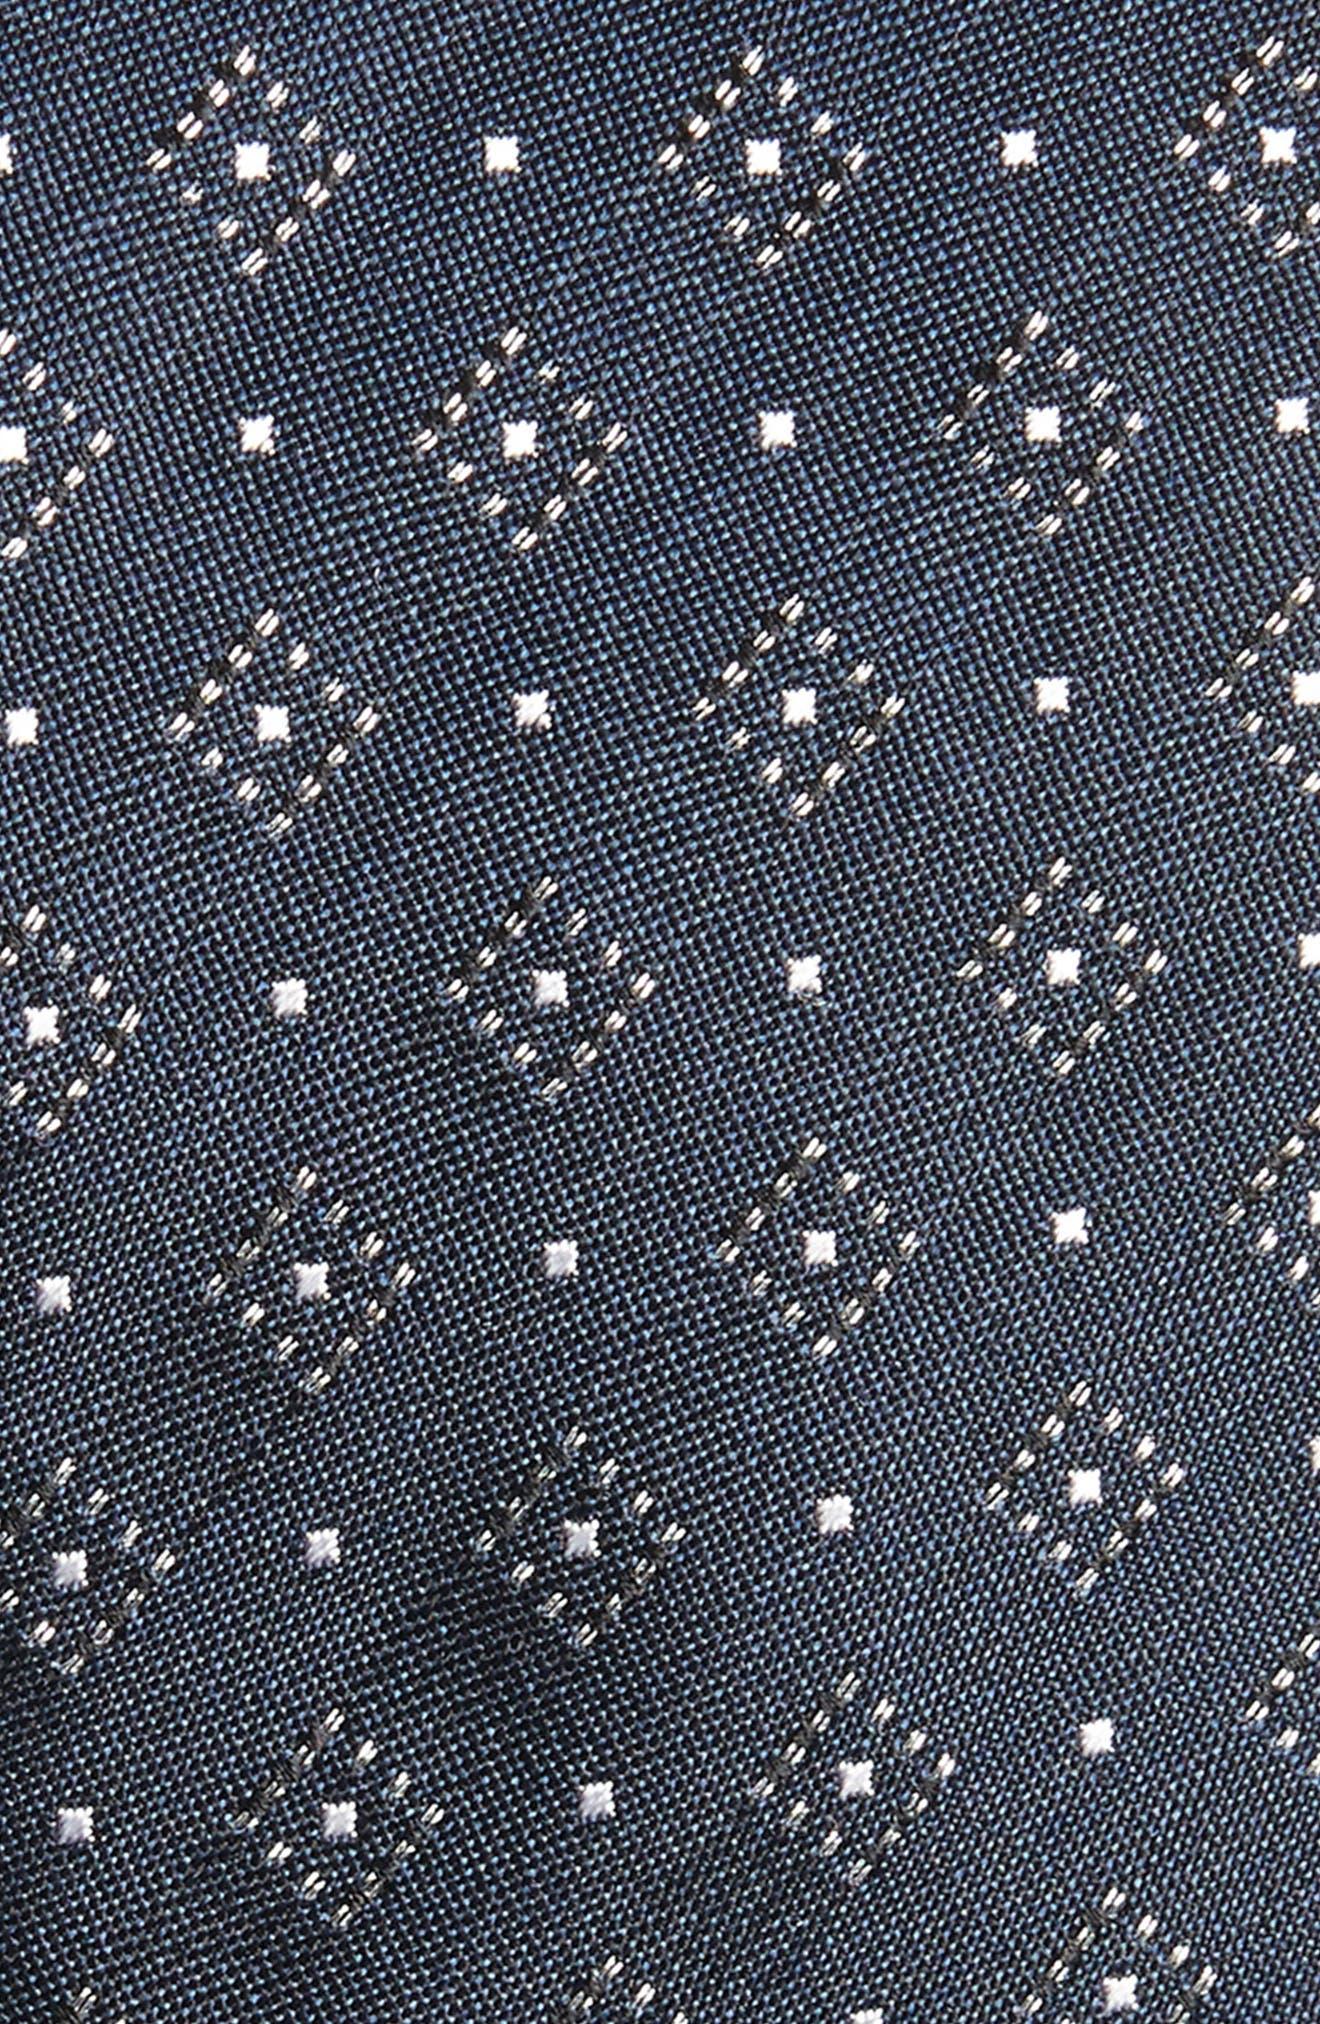 Gemstone Gala Silk Skinny Tie,                             Alternate thumbnail 2, color,                             NAVY